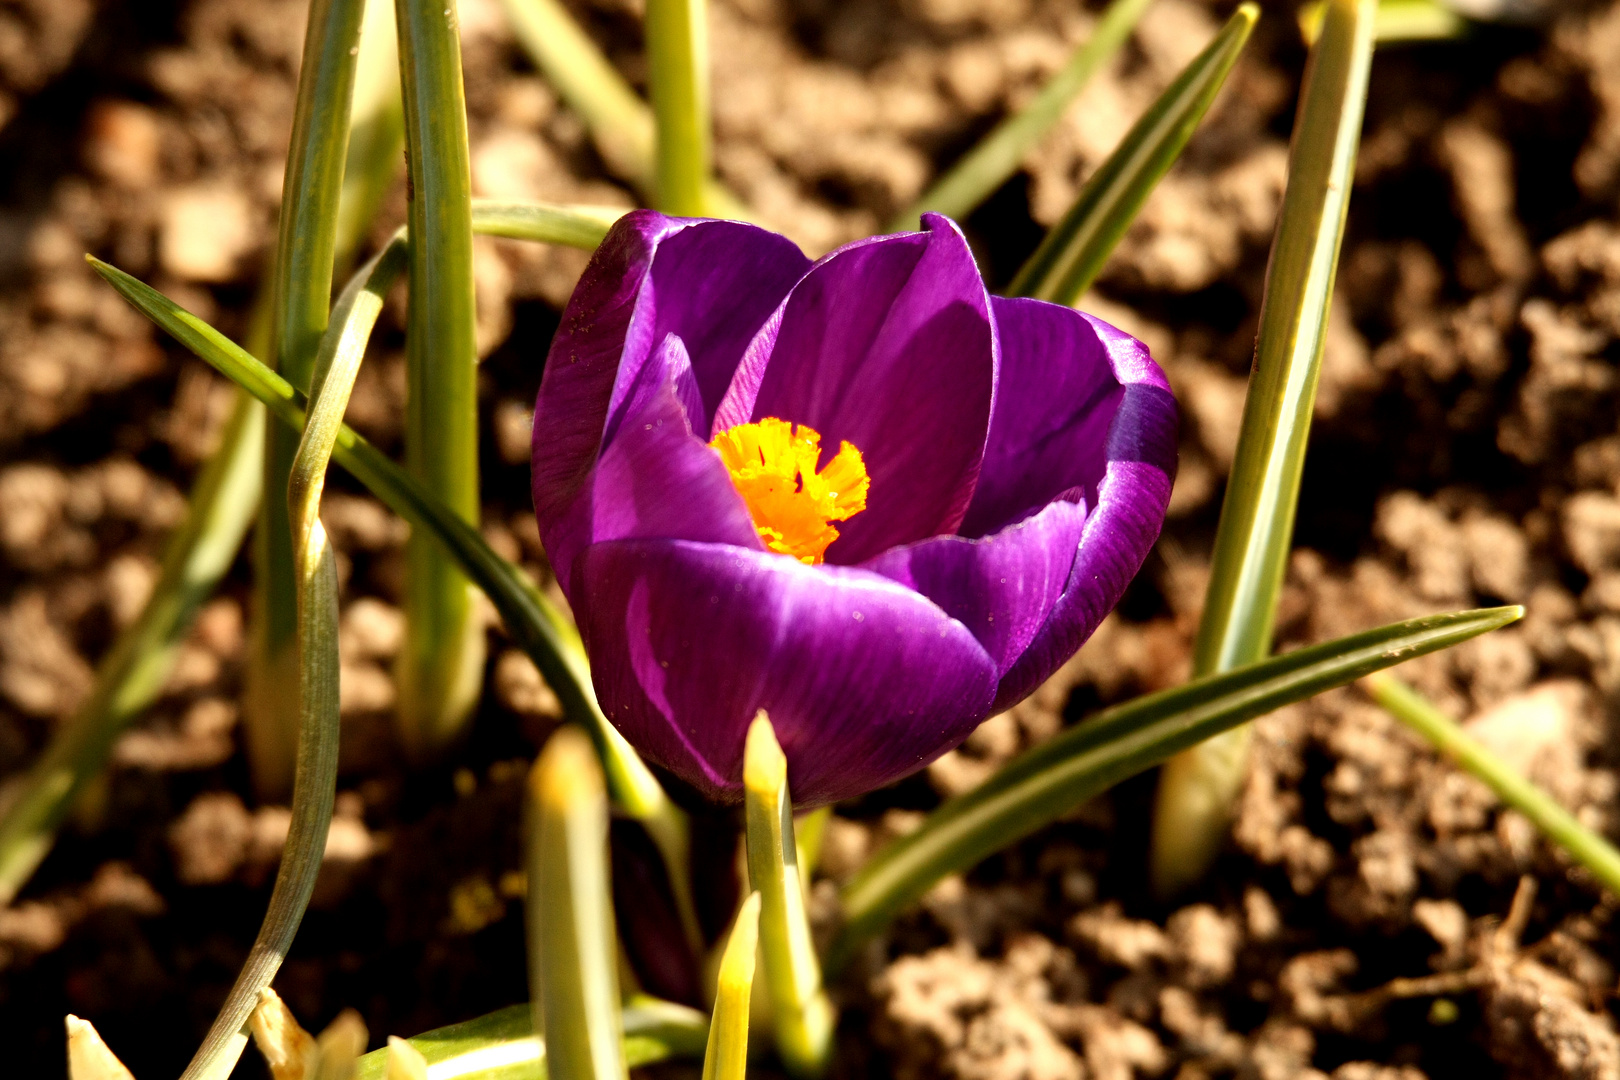 ...der Frühling naht